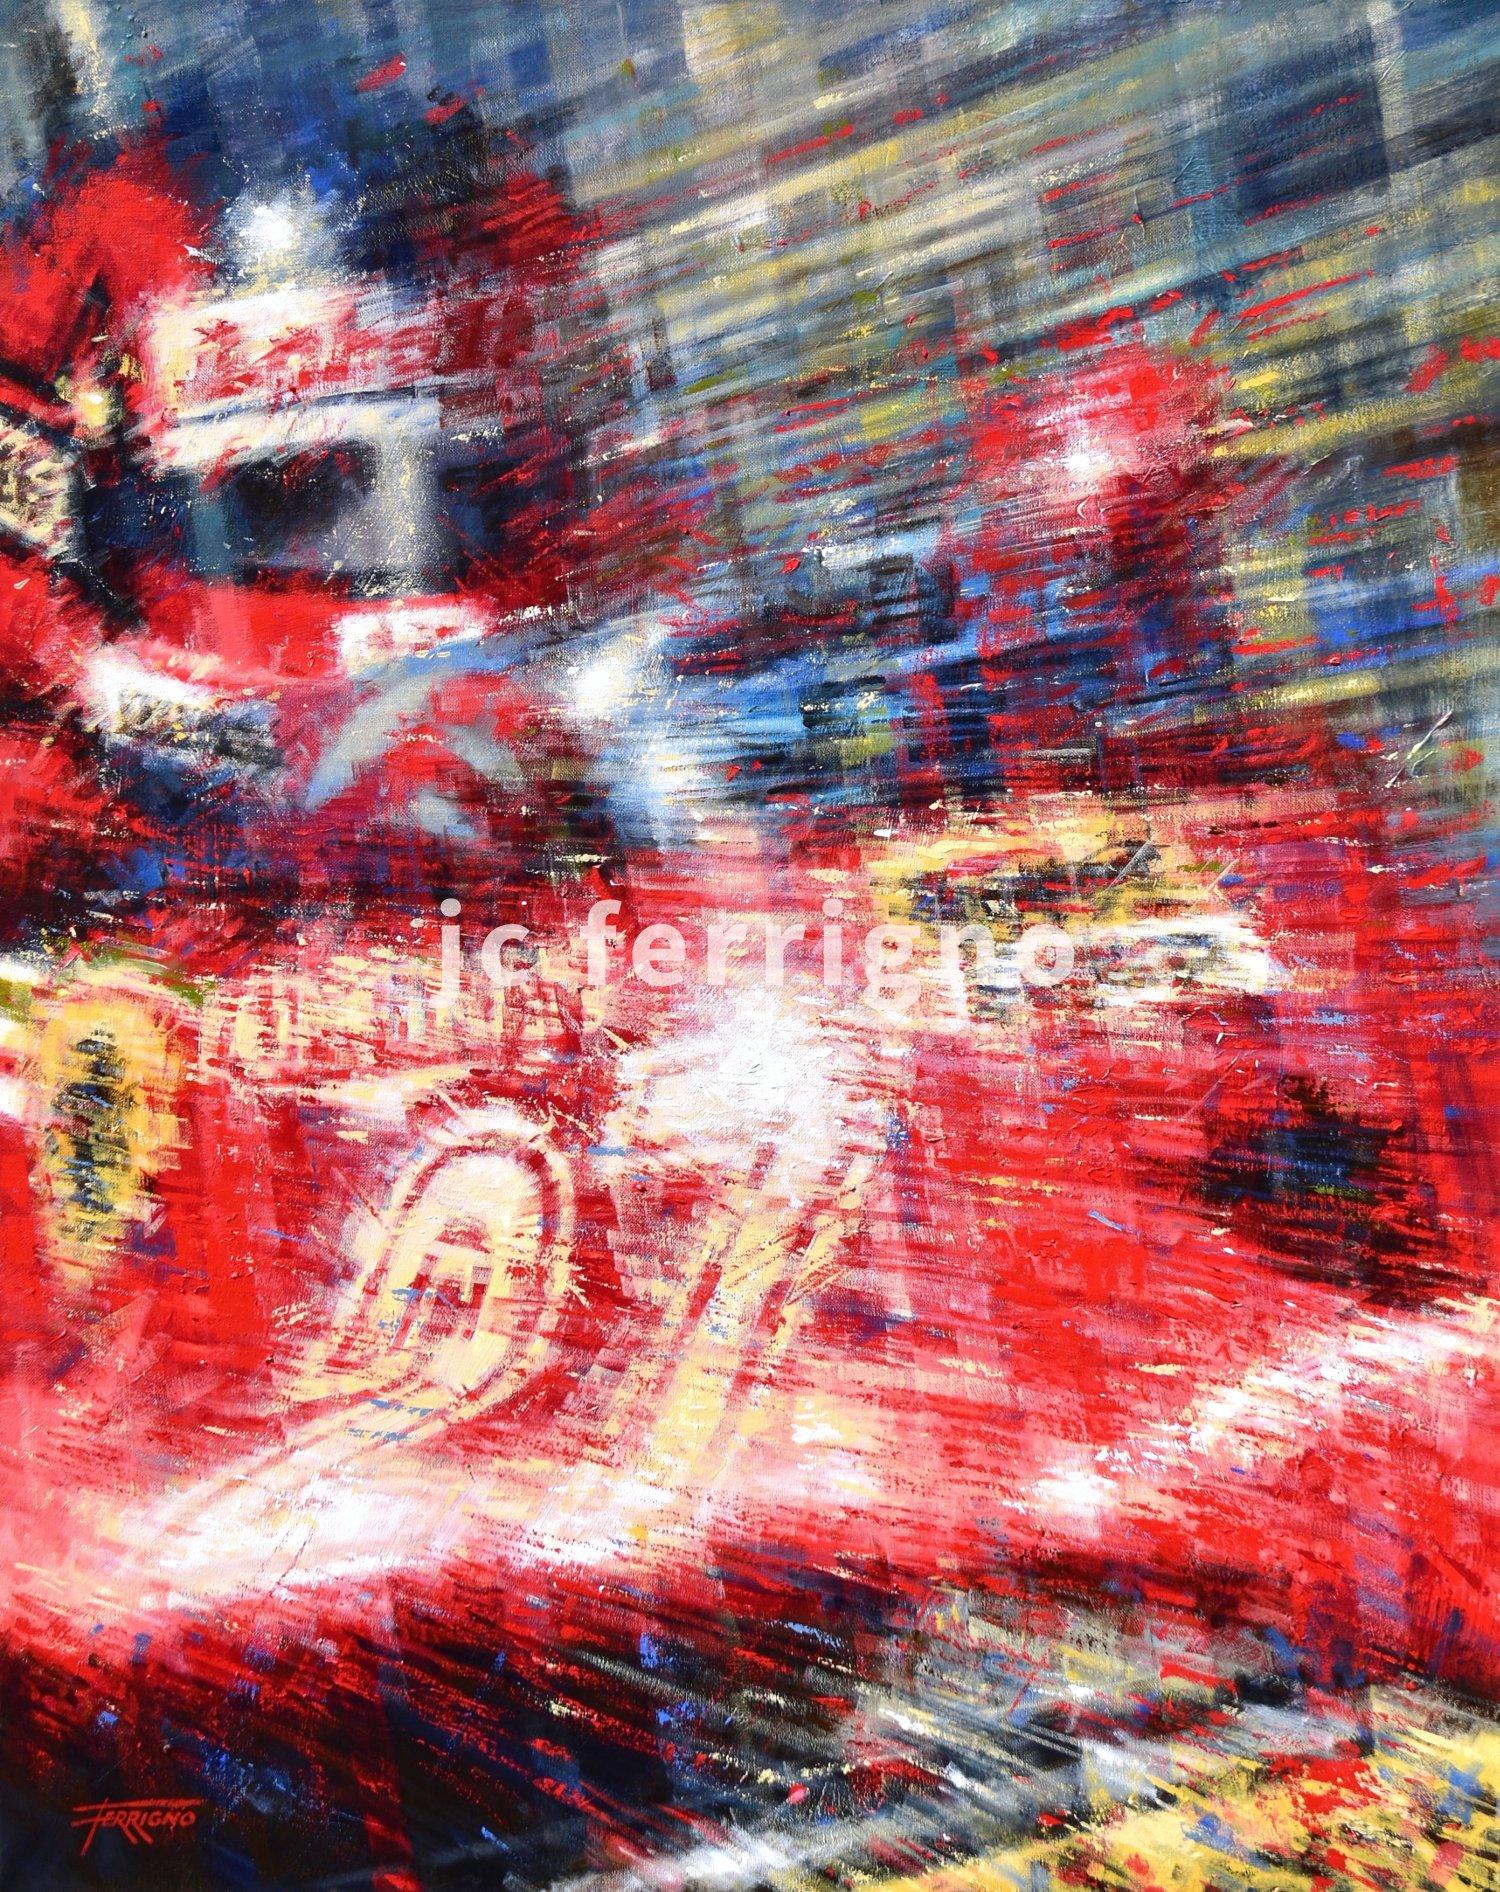 5-Gilles-70x55 cm